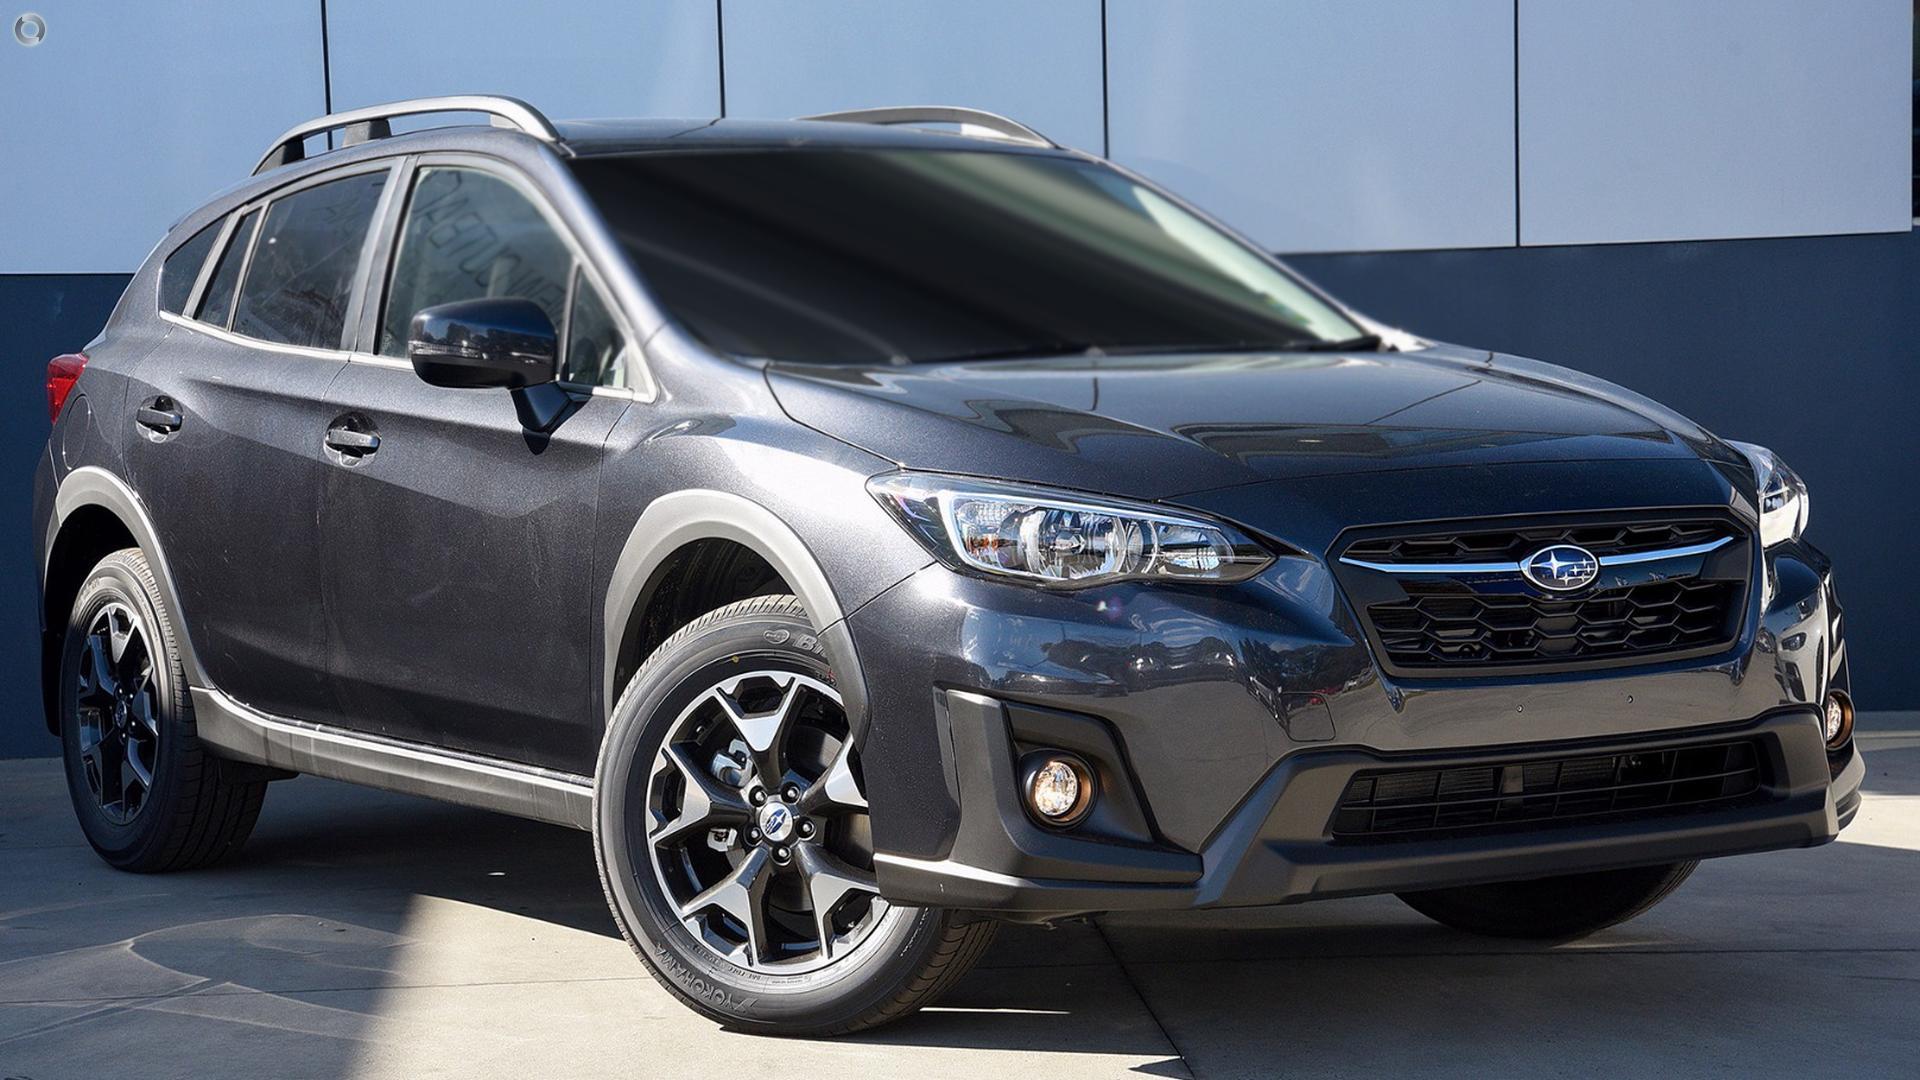 2018 Subaru Xv 2.0i Premium